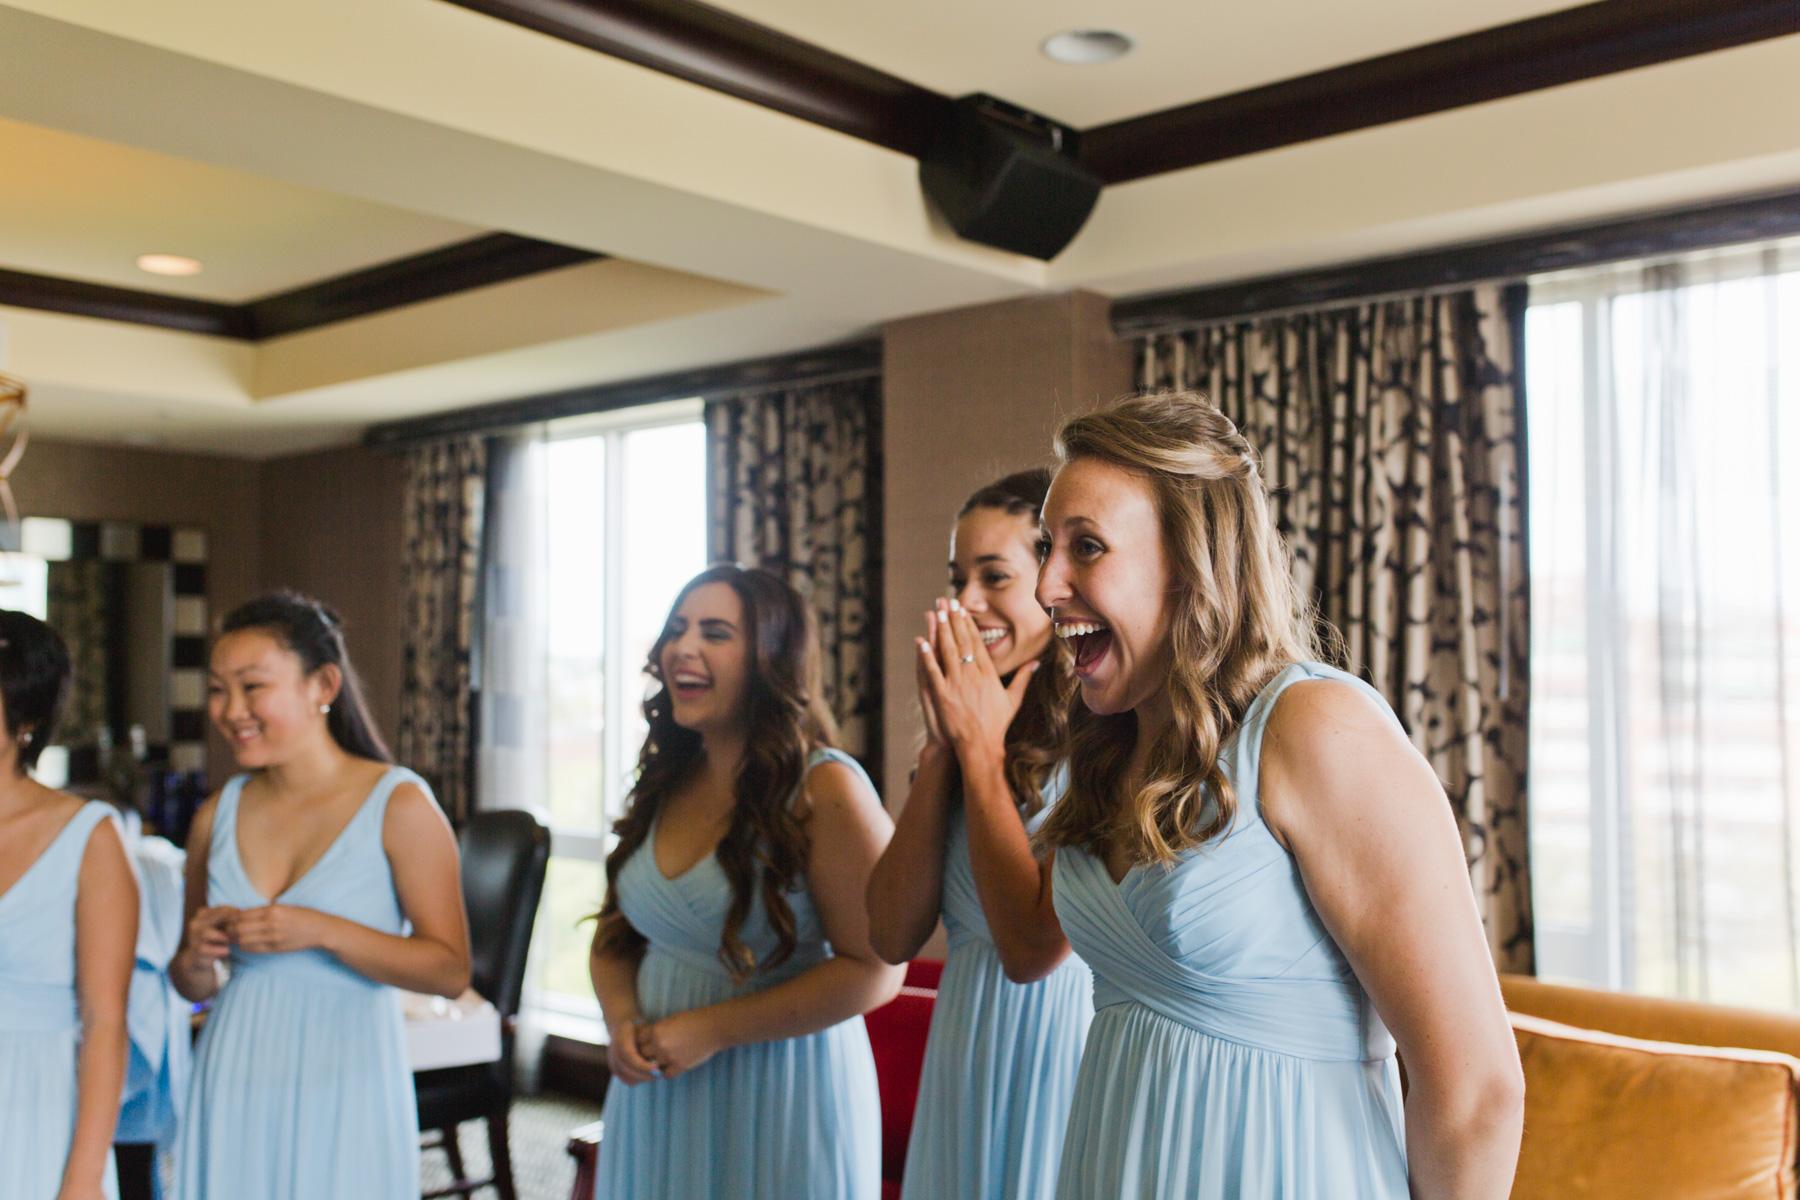 hotel marlowe bridesmaids reactions fun